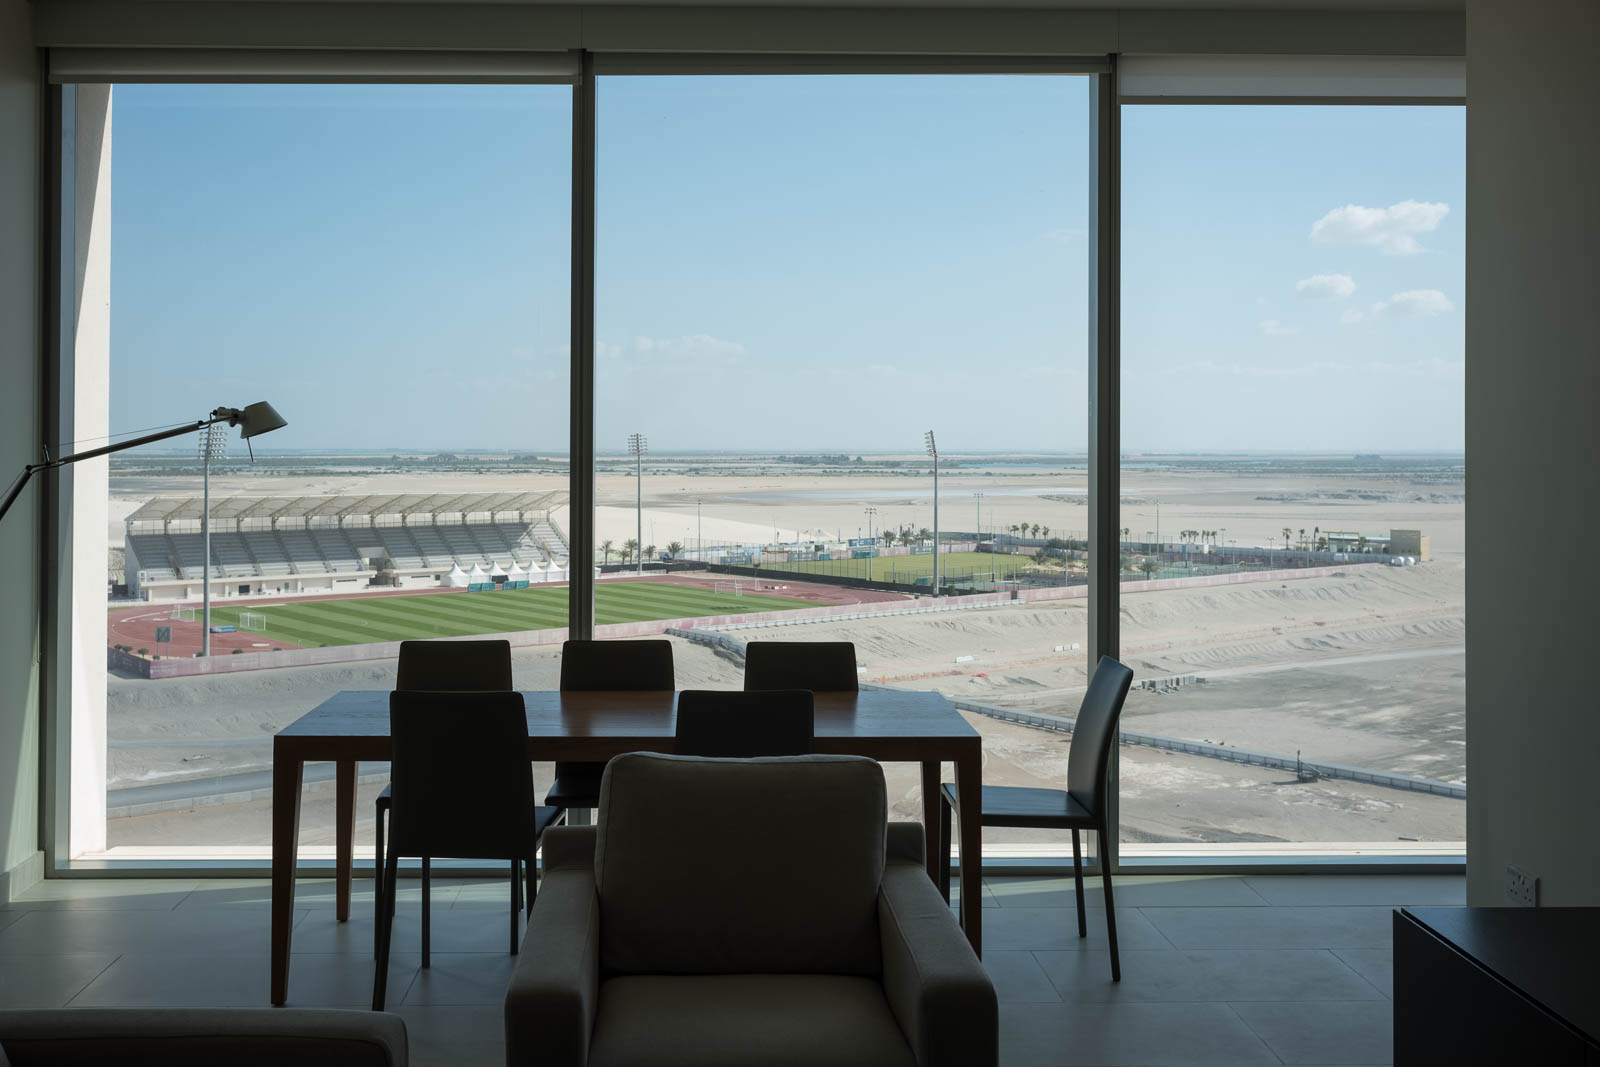 Room 711, NYU, Abu Dhabi